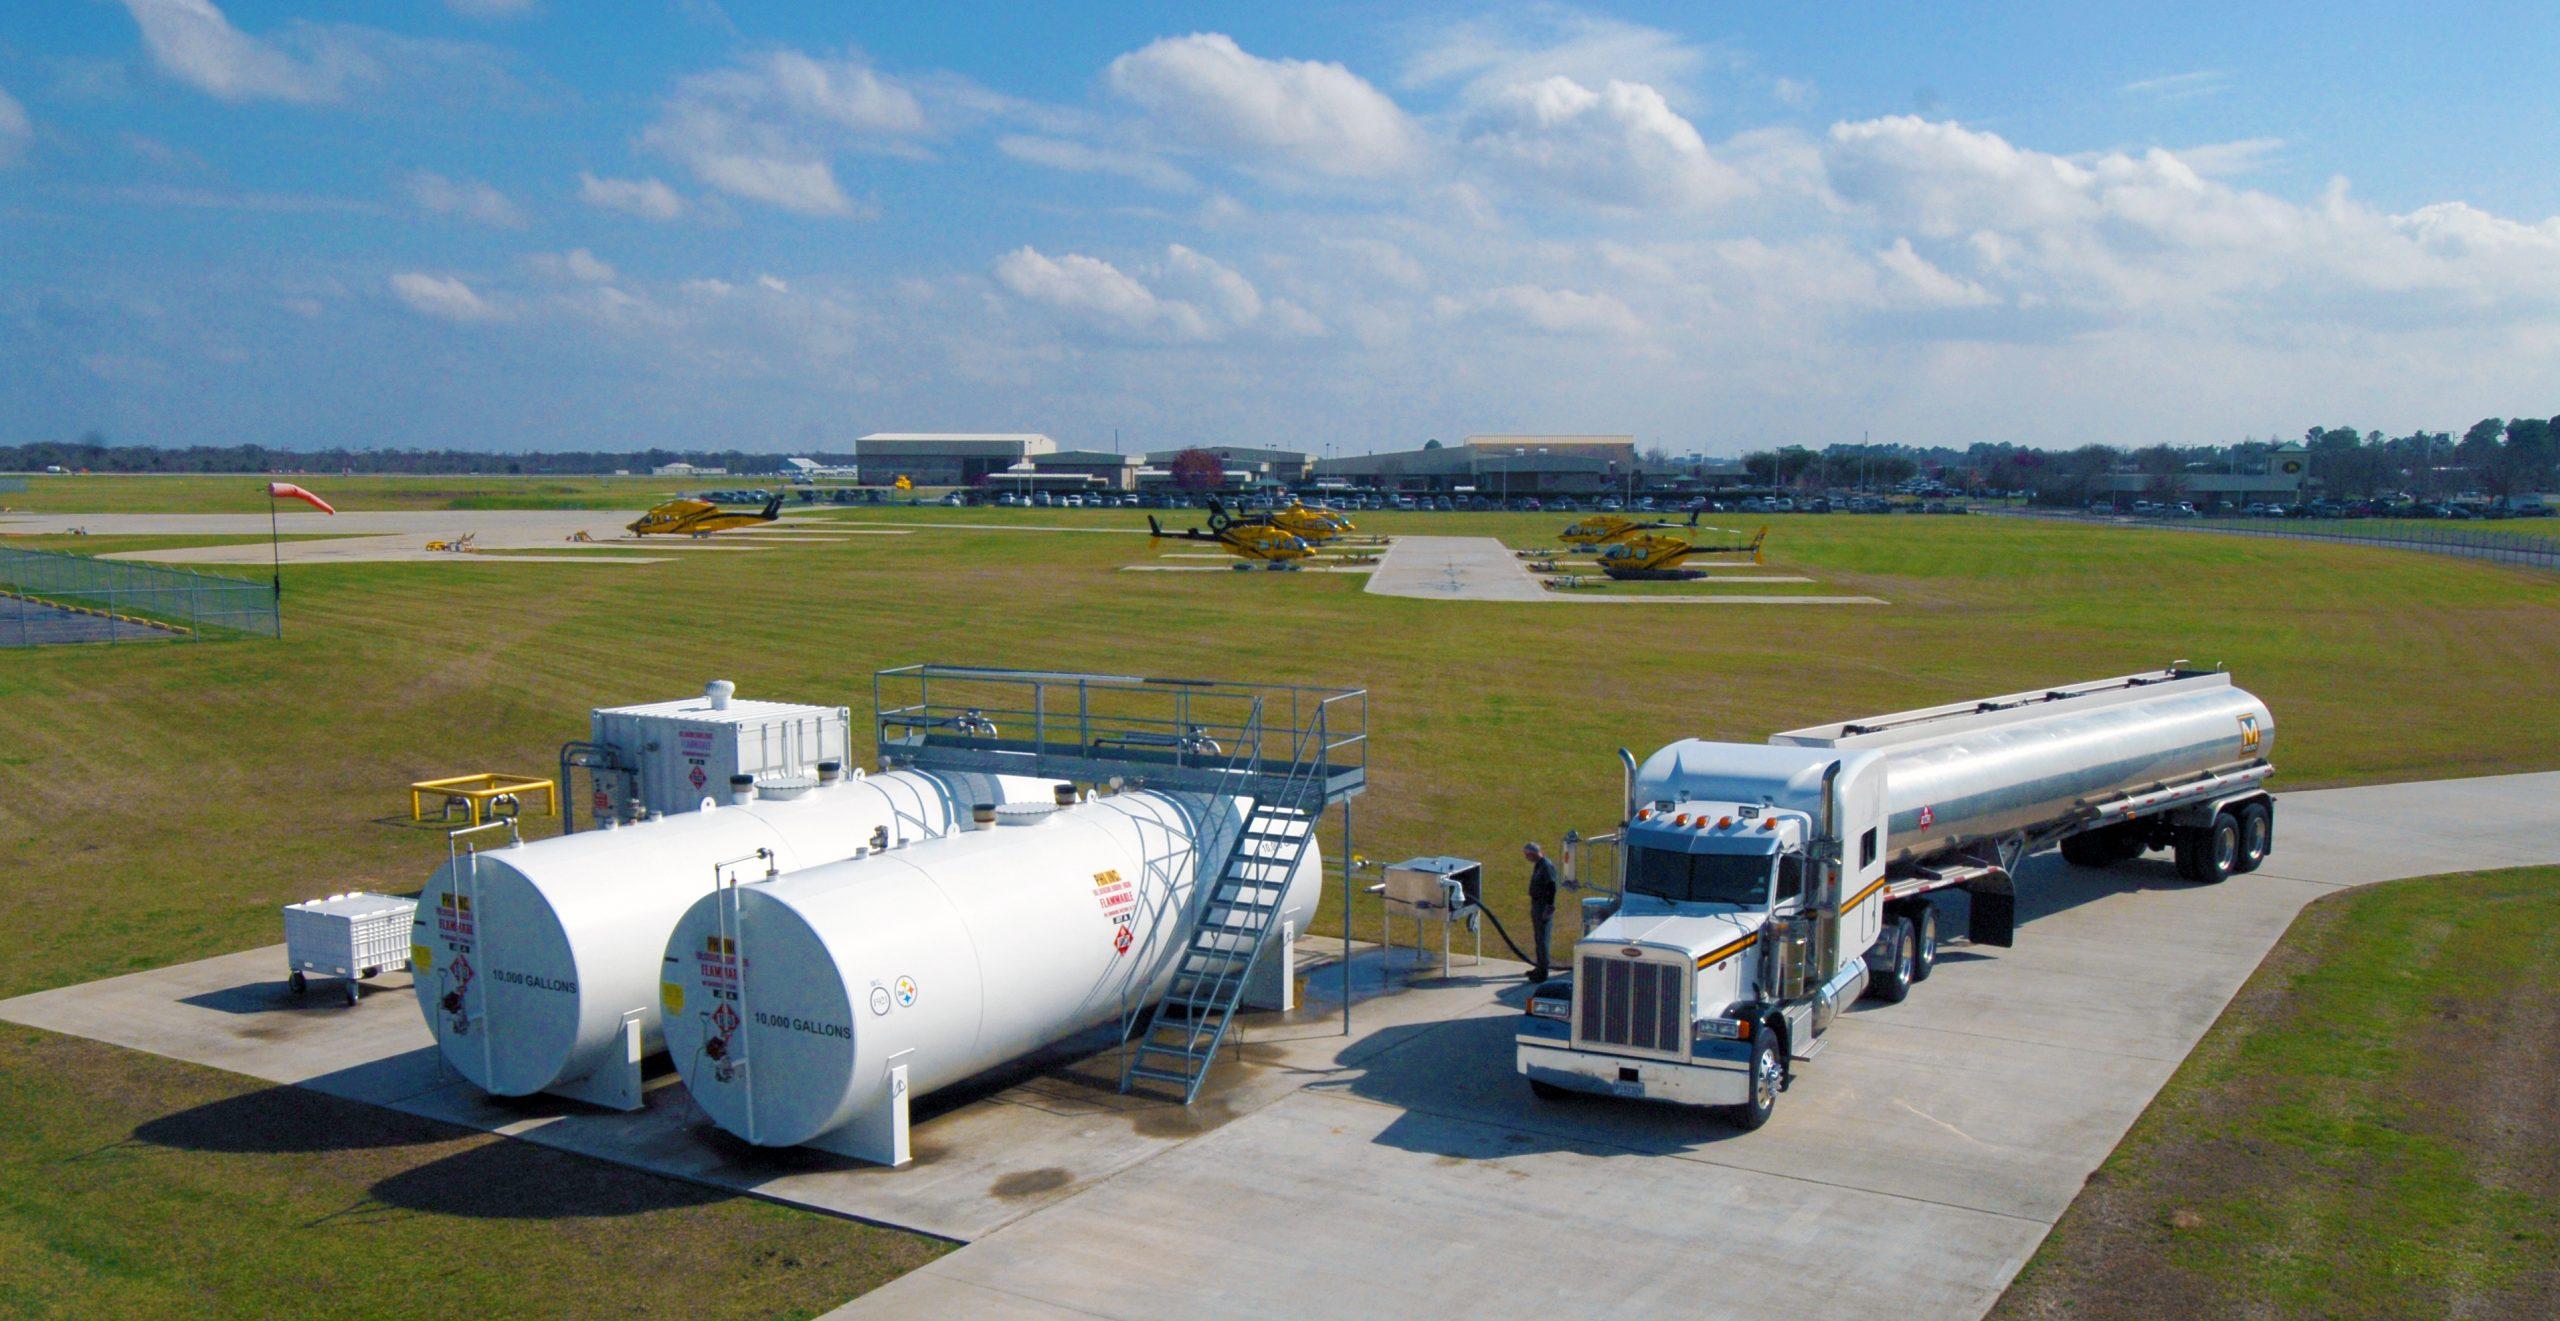 Jet-Fuel Tanker unloading